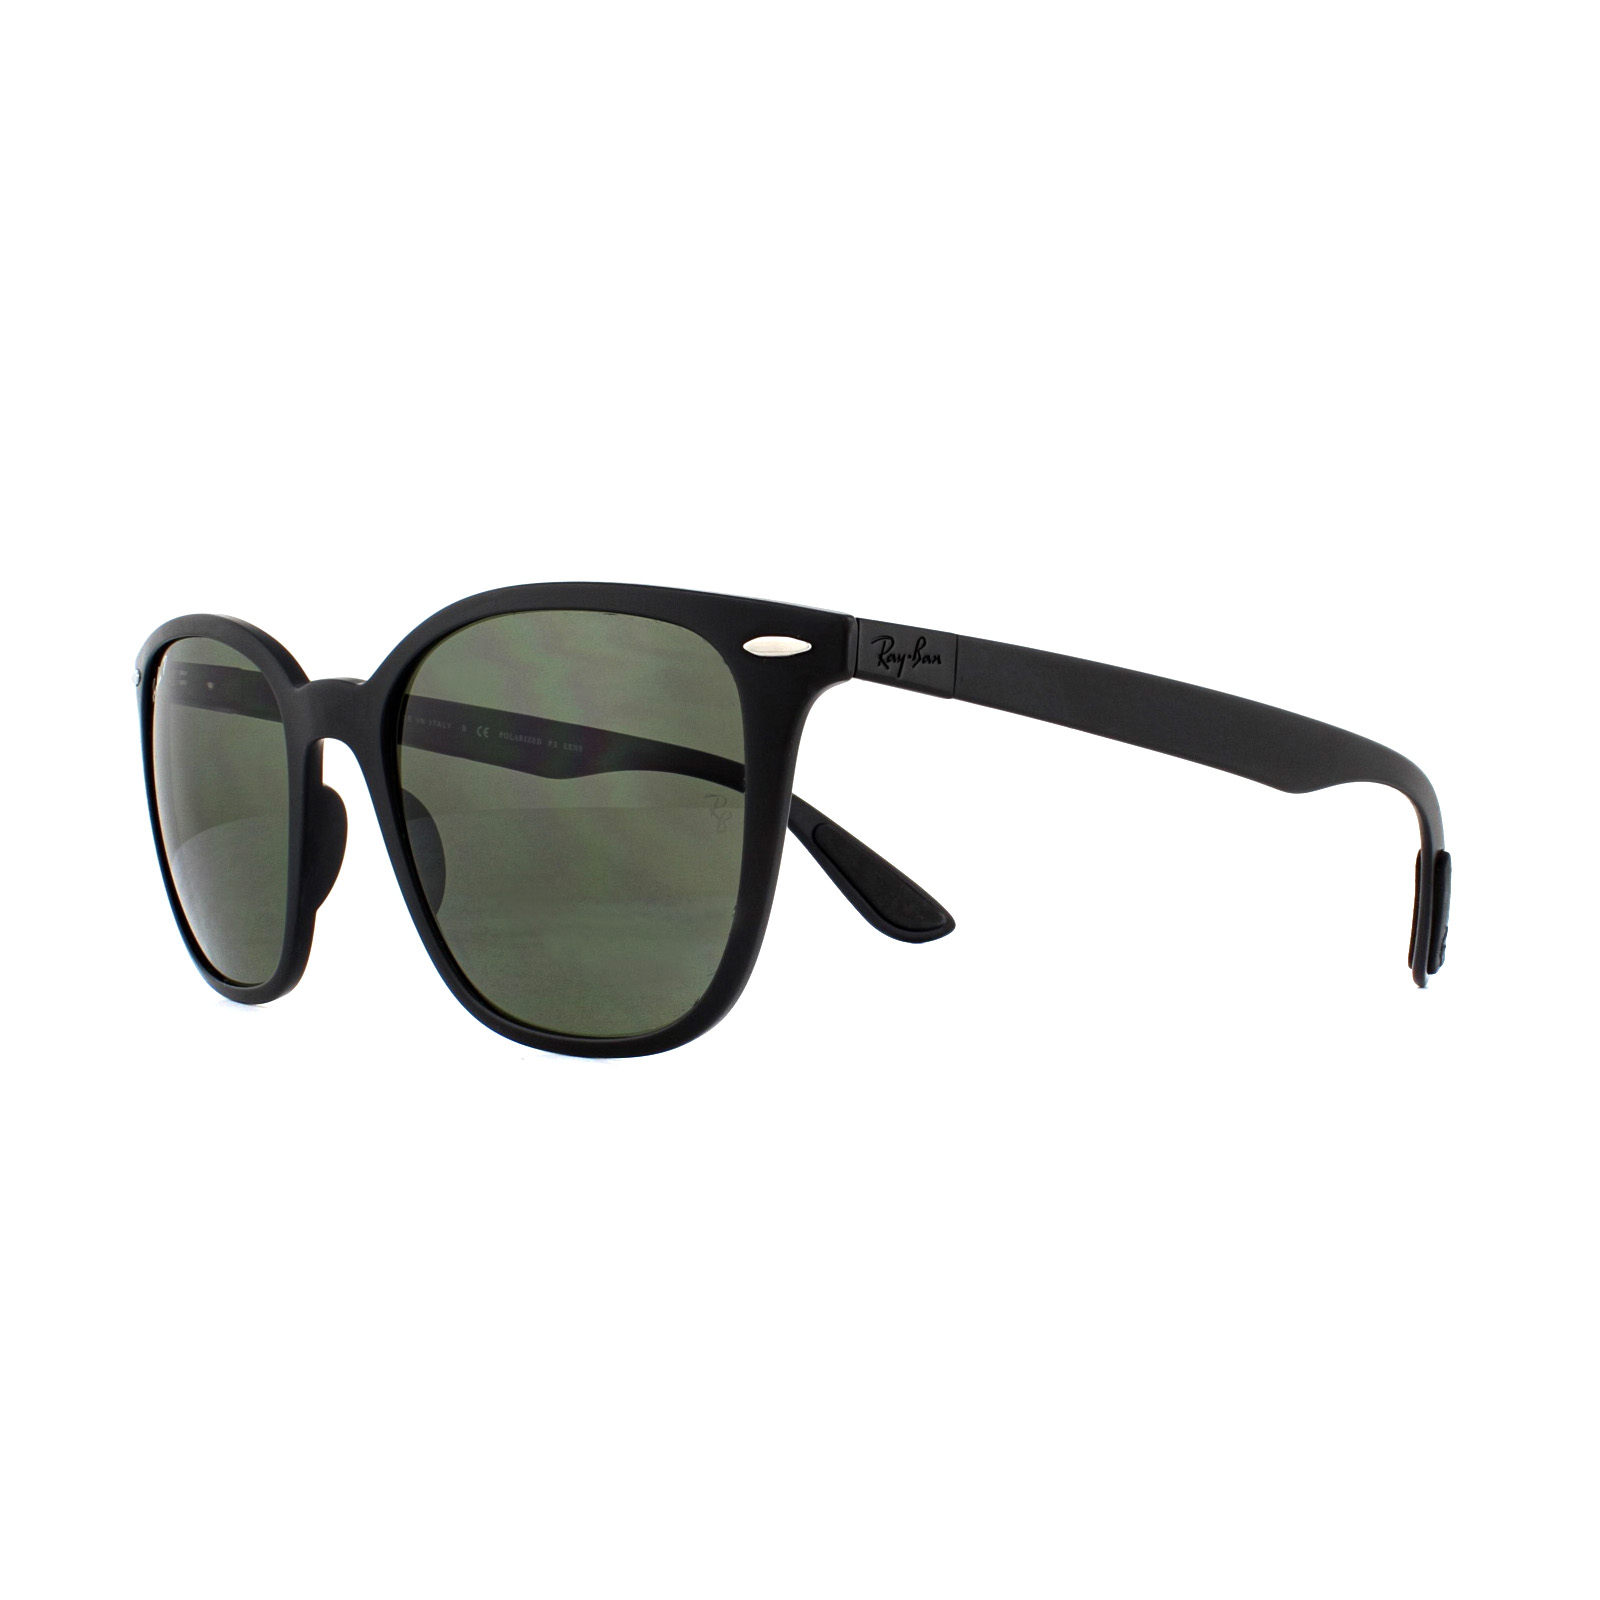 85b4d42b5c4b Sentinel Ray-Ban Sunglasses RB4297 601S9A Matte Black Green Polarized